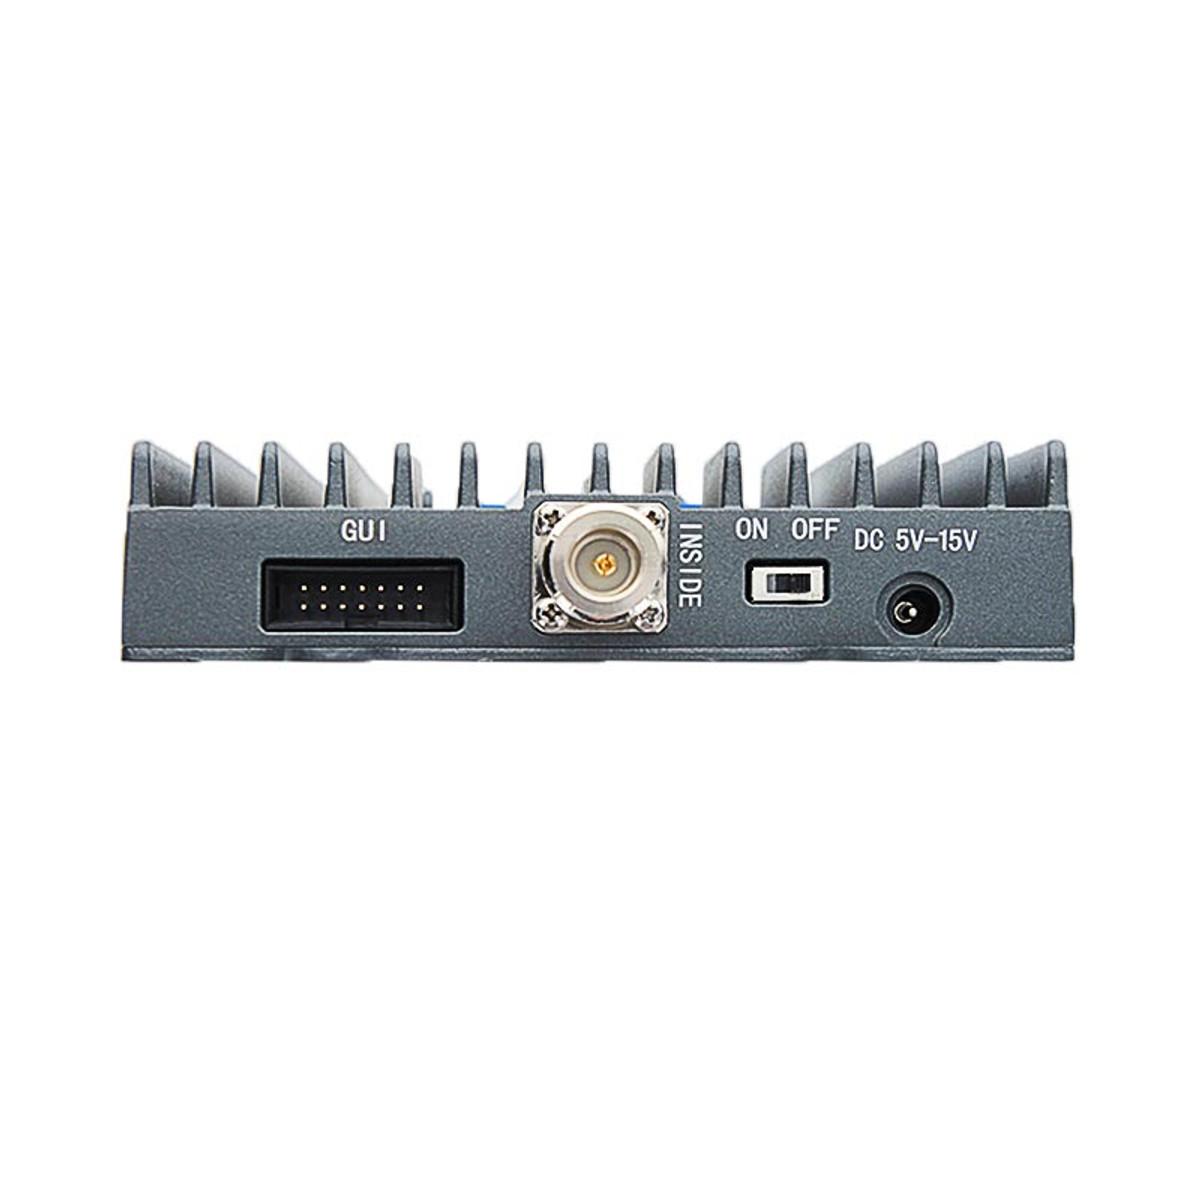 SureCall FlexPro 3G Signal Booster with Yagi & Whip Antennas | Top view